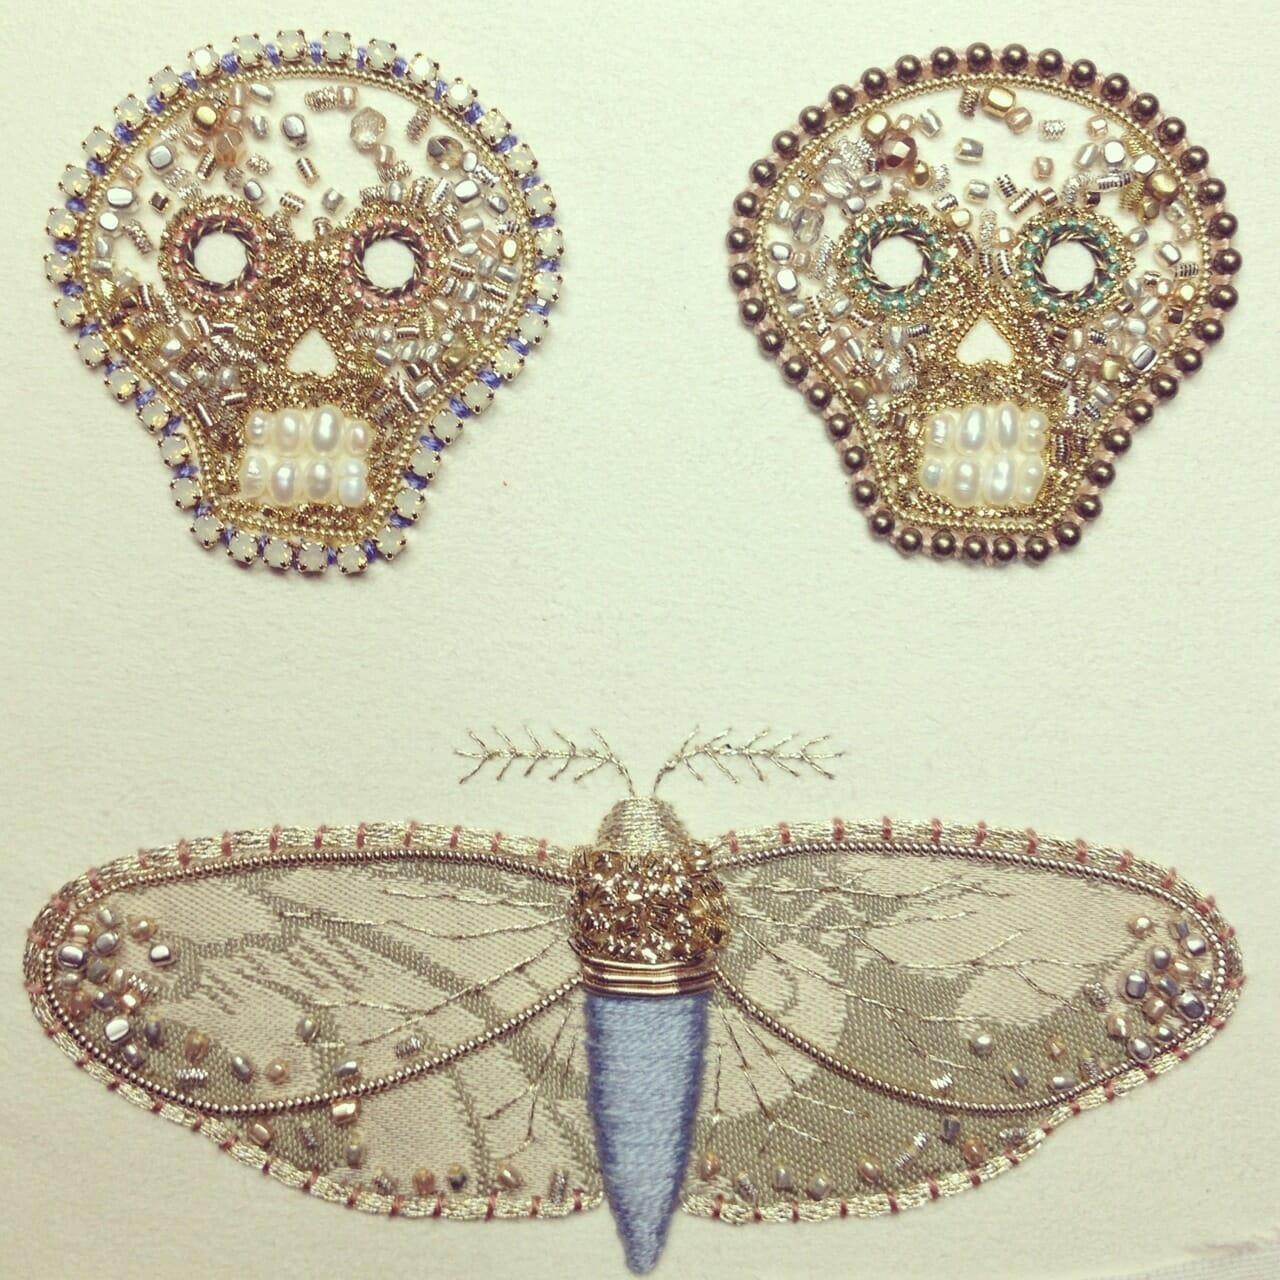 Azumi Sakata - Skulls and Moth Embroidery